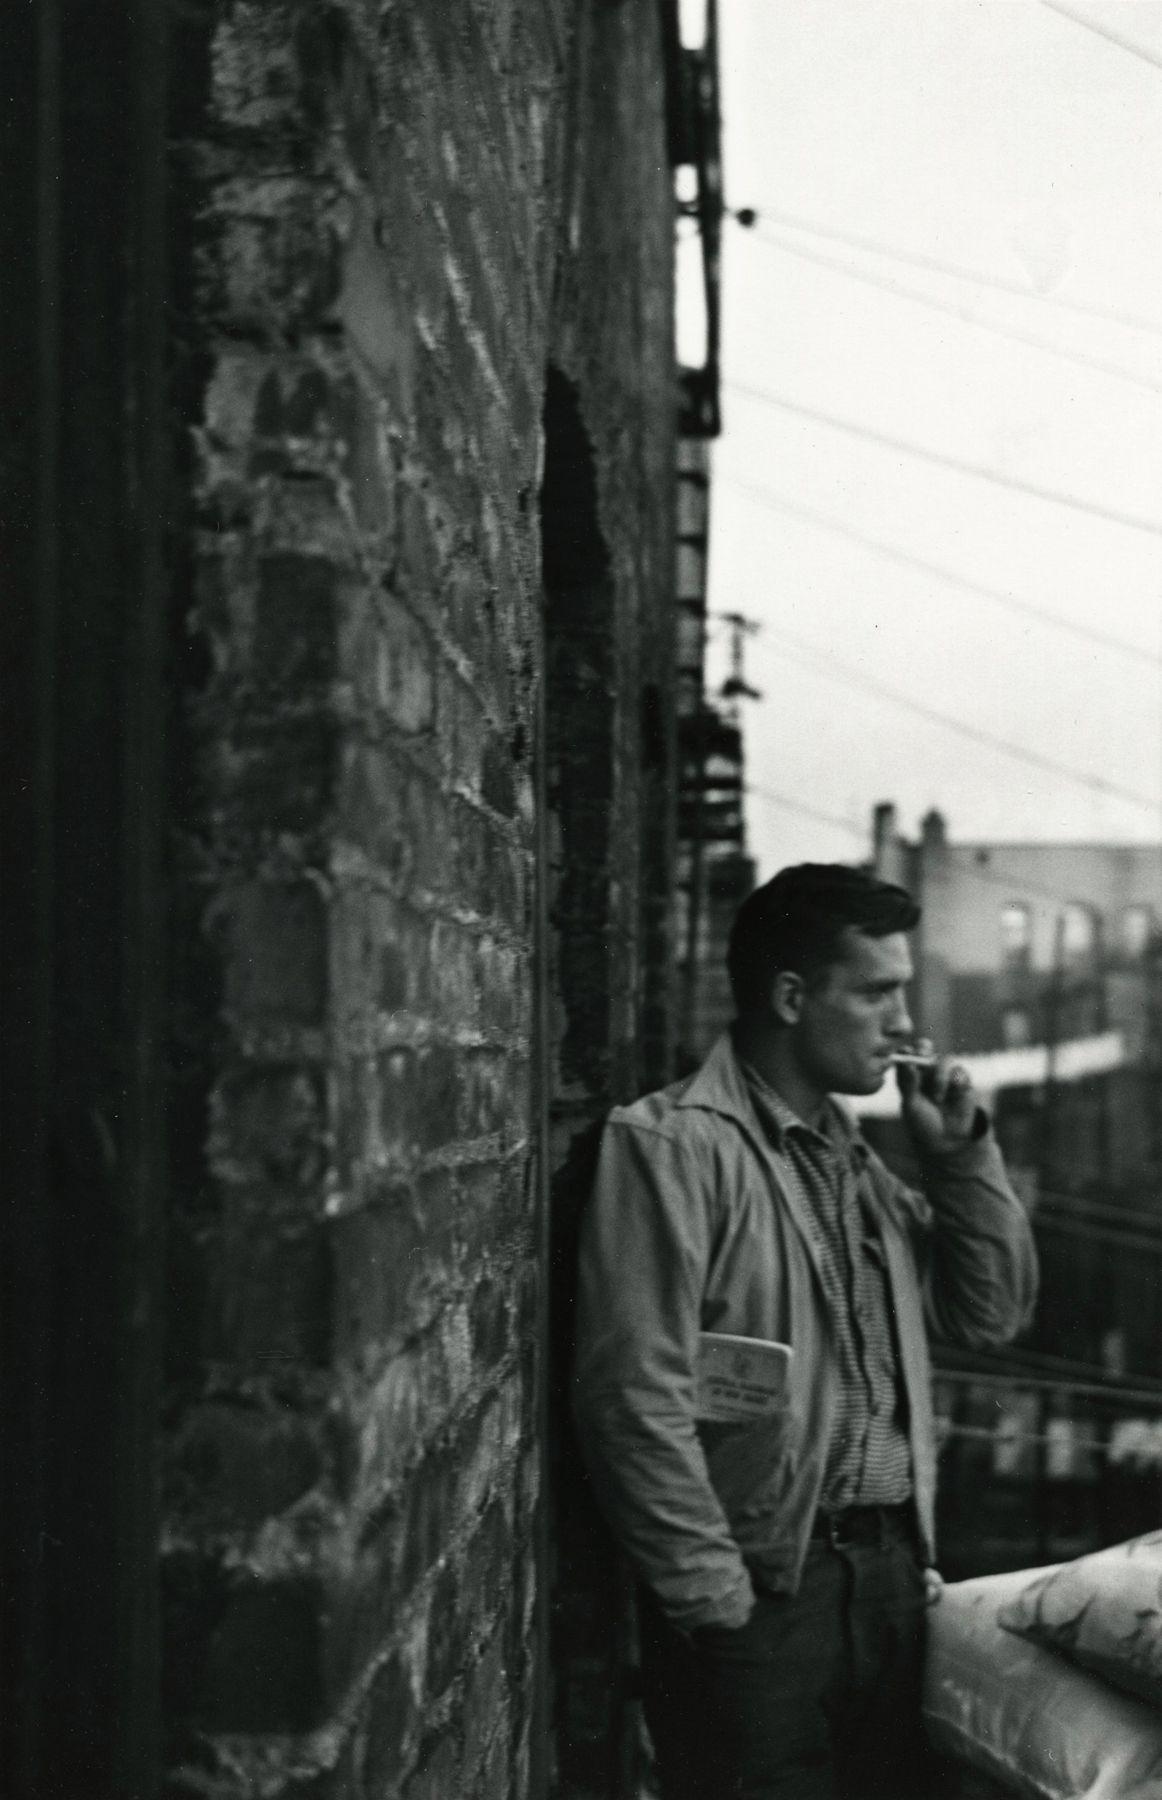 Allen Ginsberg - Heroic portrait of Jack Kerouac with R.R Brakeman's manual in pocket, fire-esape 206 E. 7th Street, NY, 16-Dec-86- Howard Greenberg Gallery